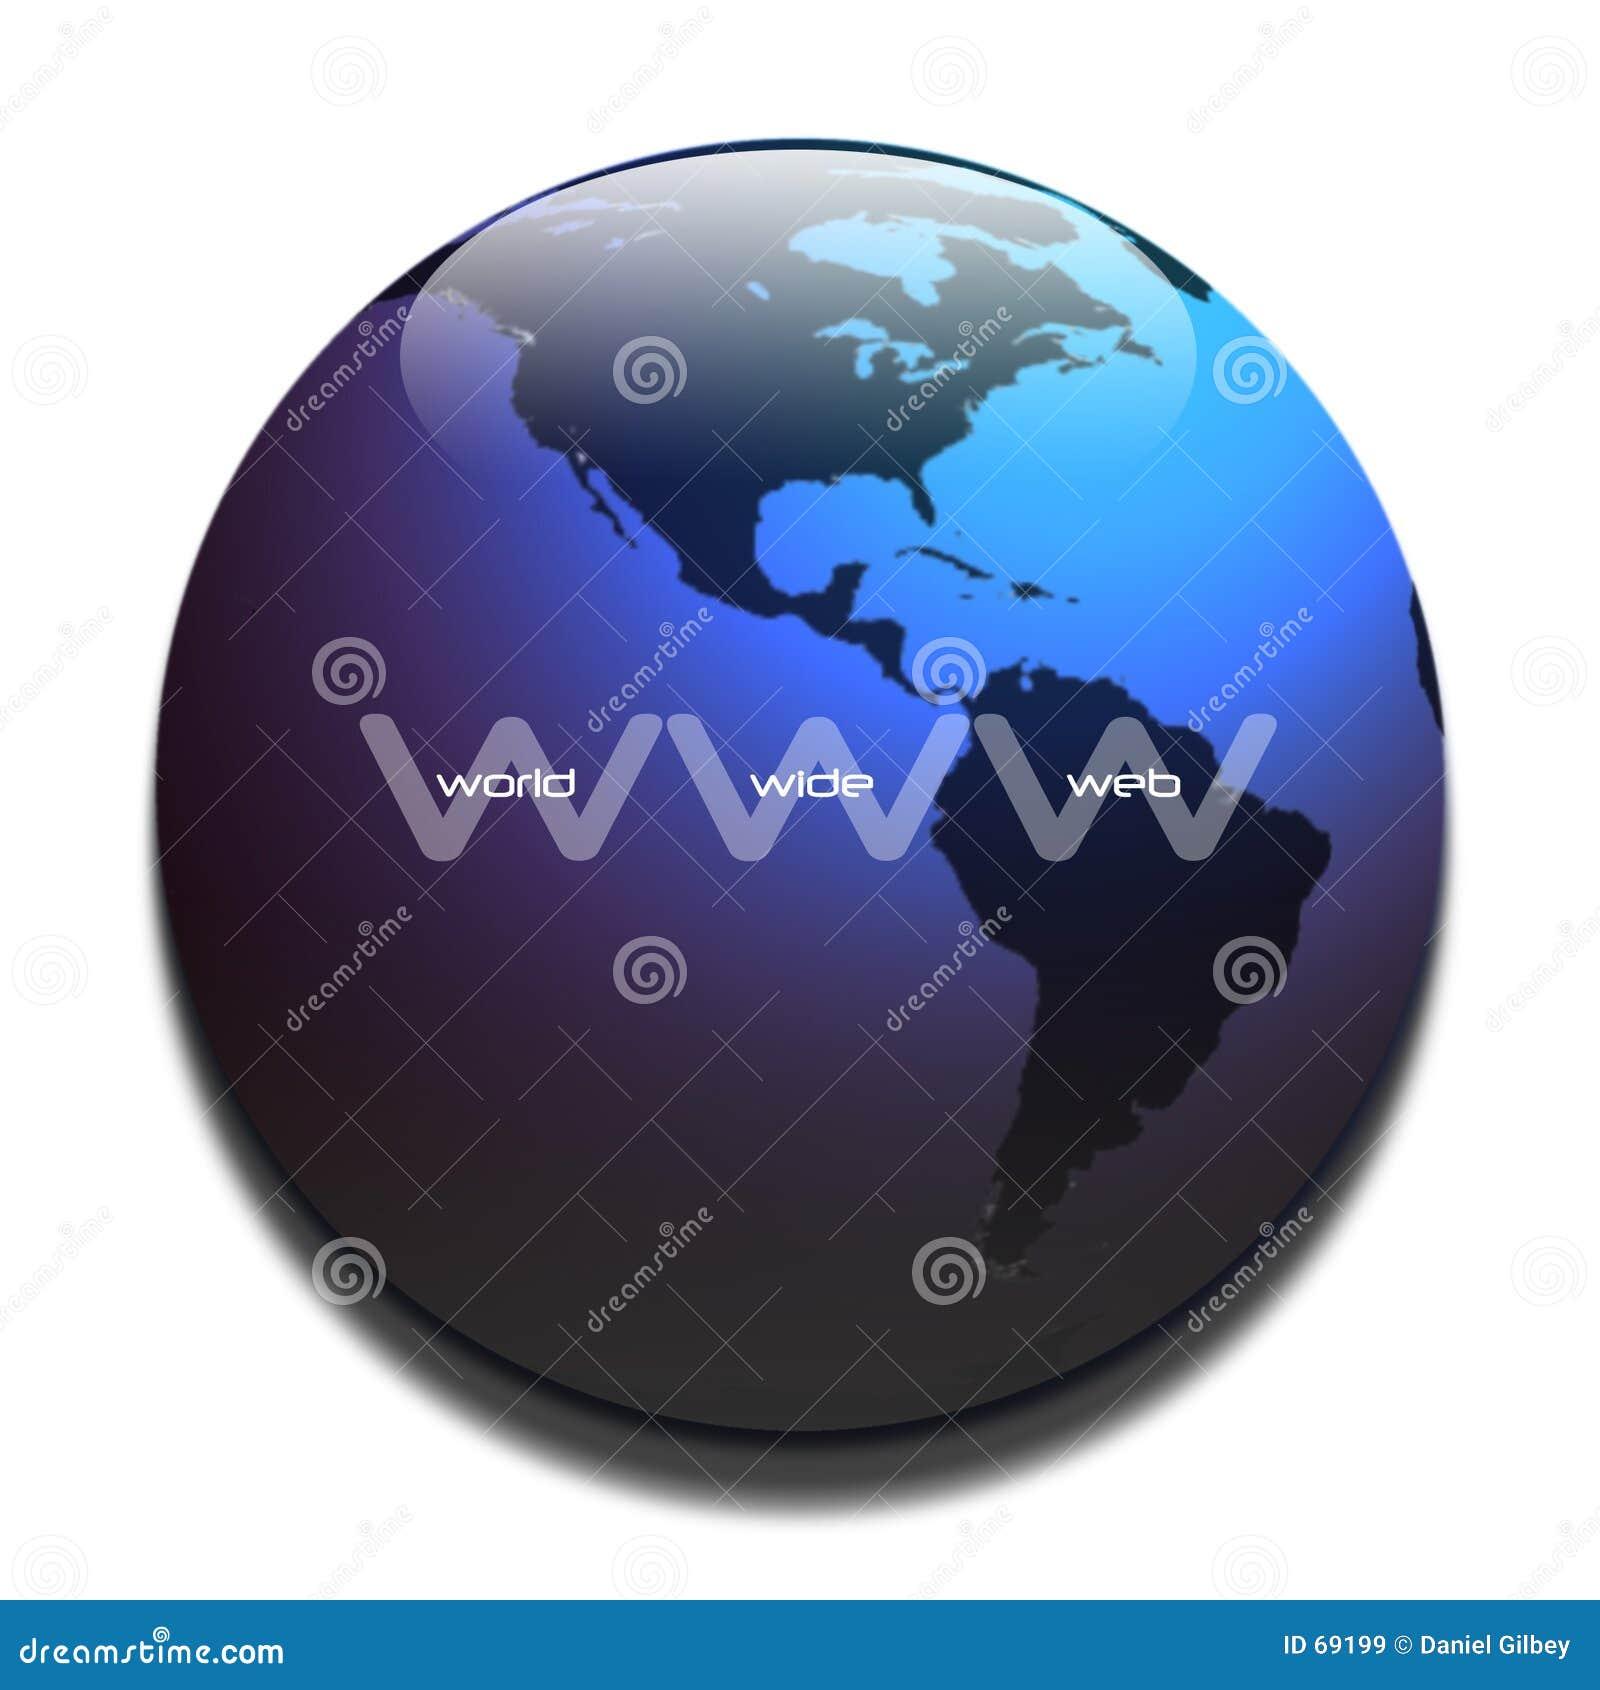 Accept. world wide web similar. think